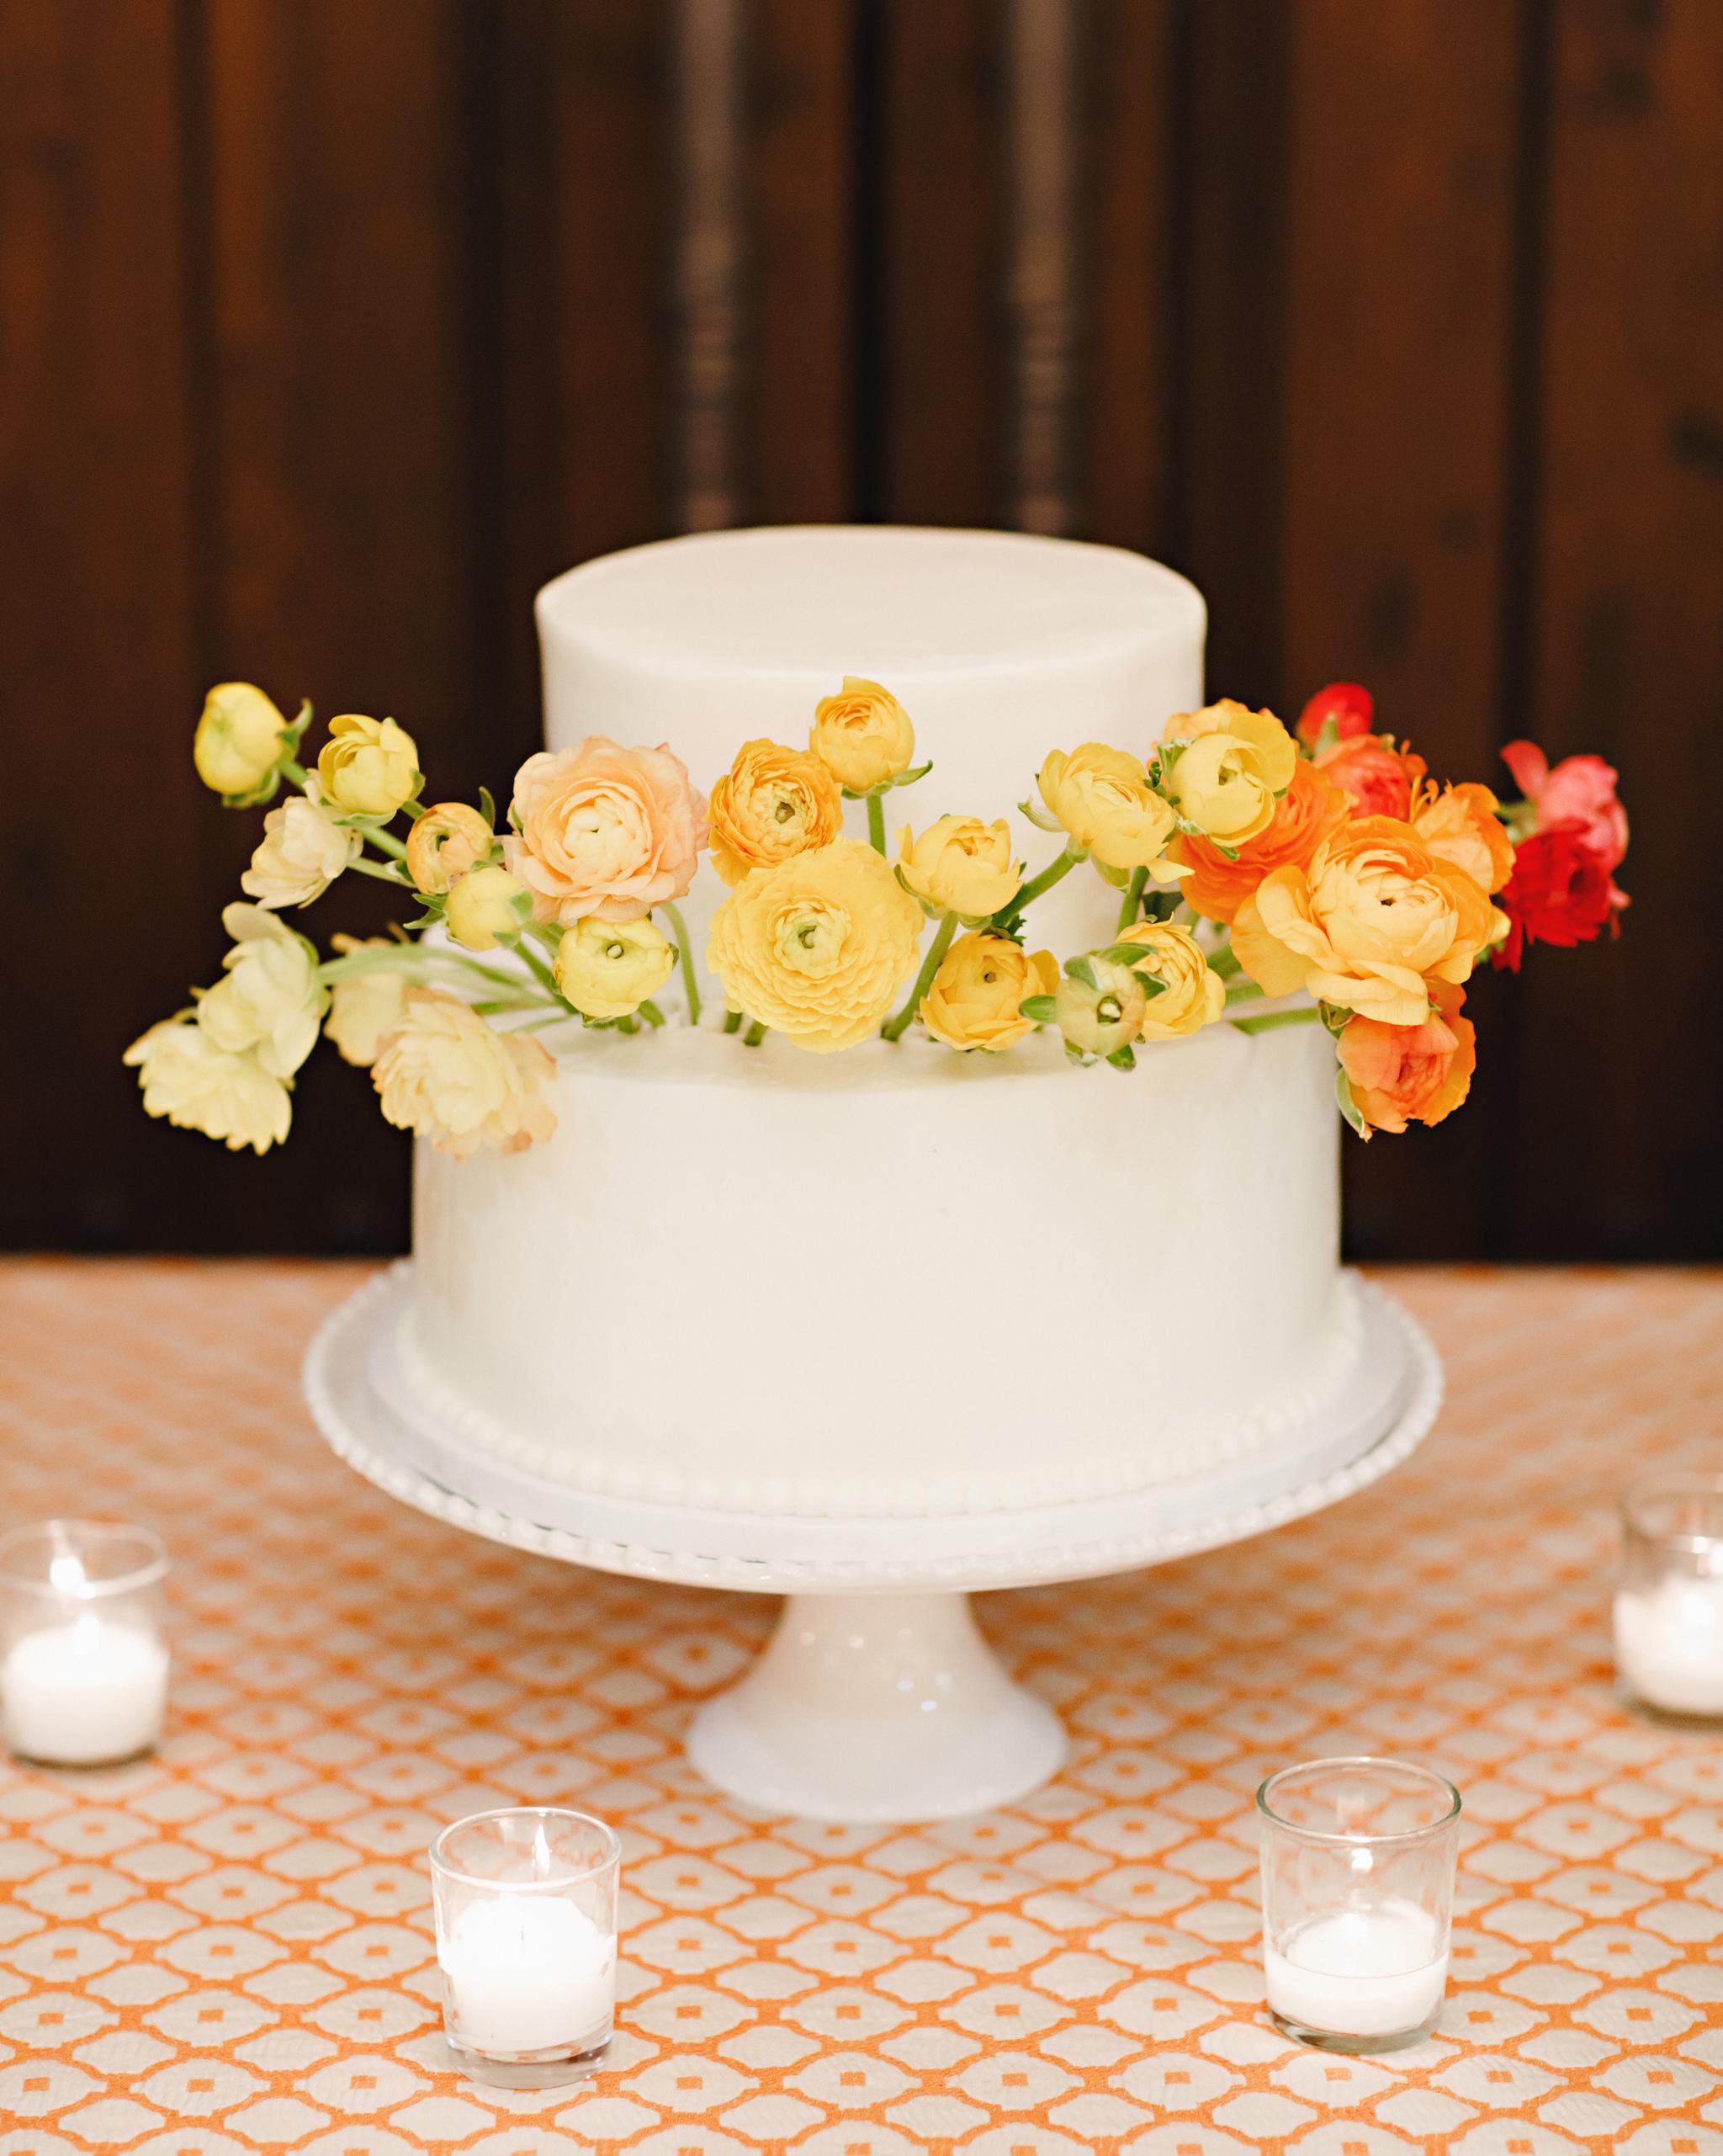 liz-allen-wedding-cake-0672-s111494-0914.jpg